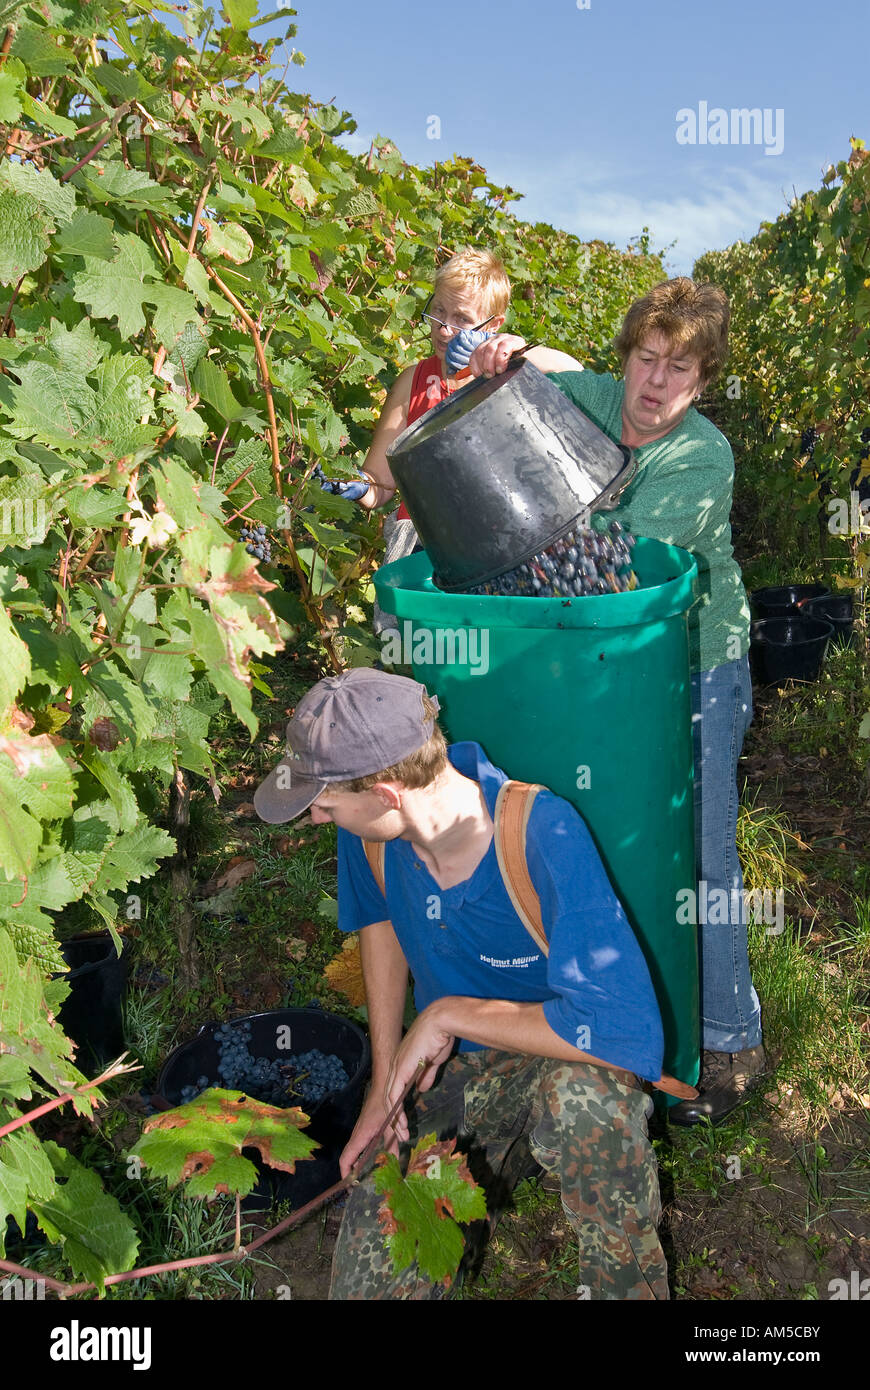 Grape gathering (Blauer Portugieser and Dornfelder) in Unfinden, Hassberge, Lower Franconia, Bavaria, Germany Stock Photo